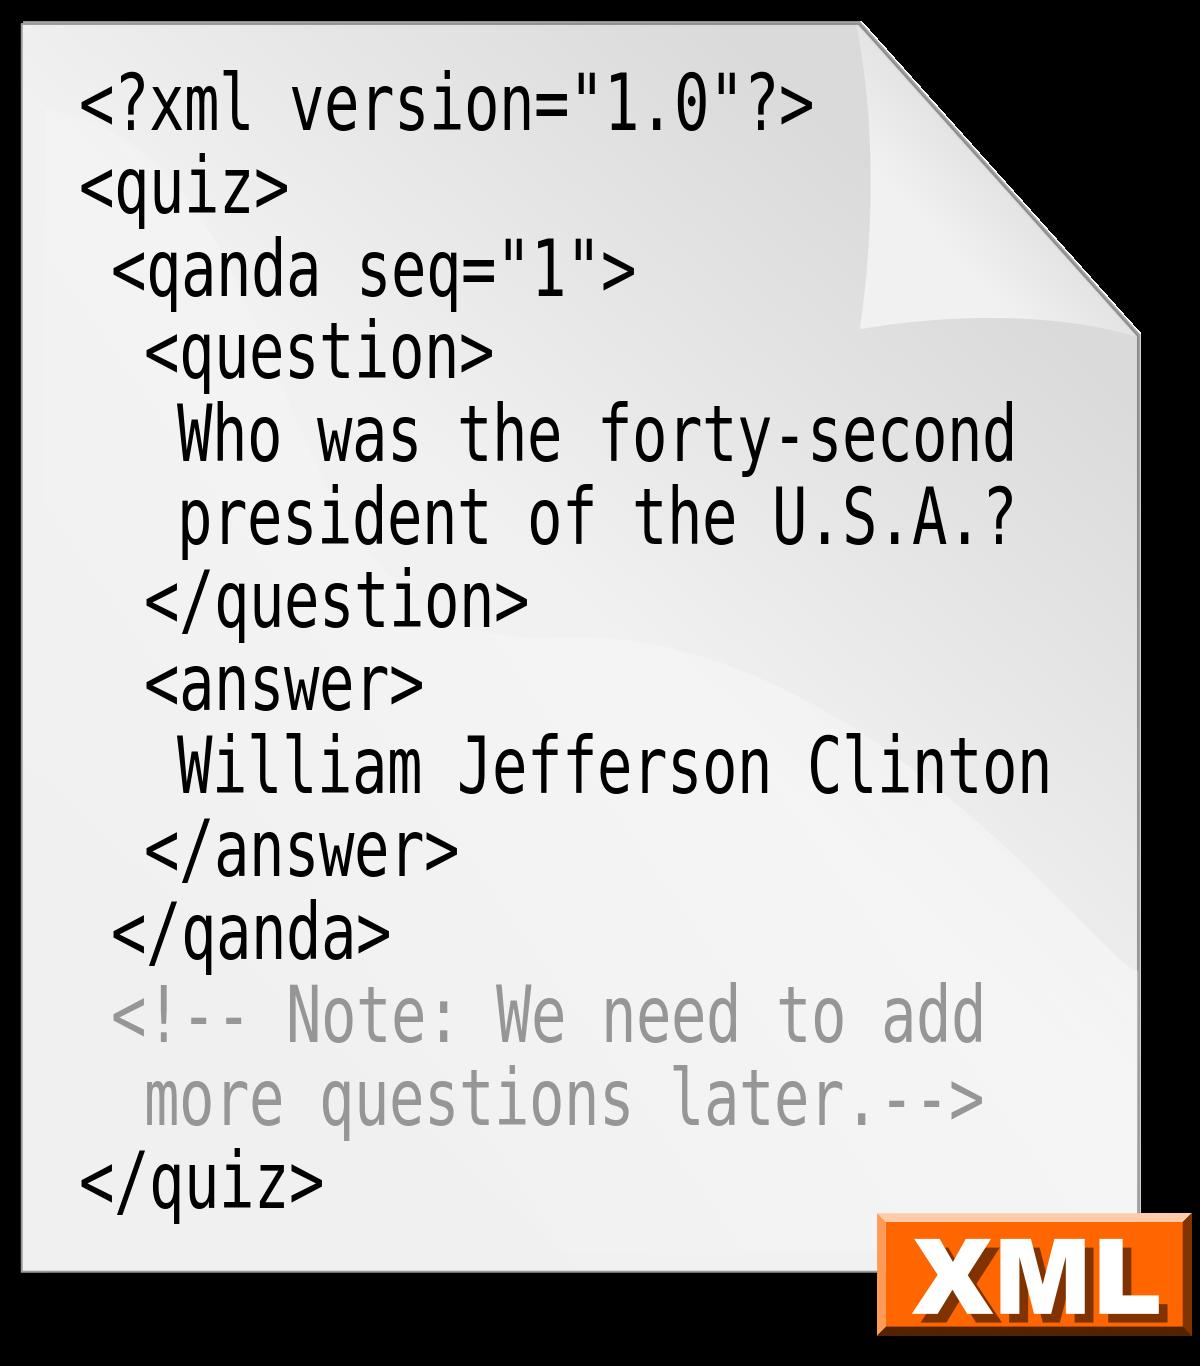 junit-xml-ml - File Exchange - MATLAB Central